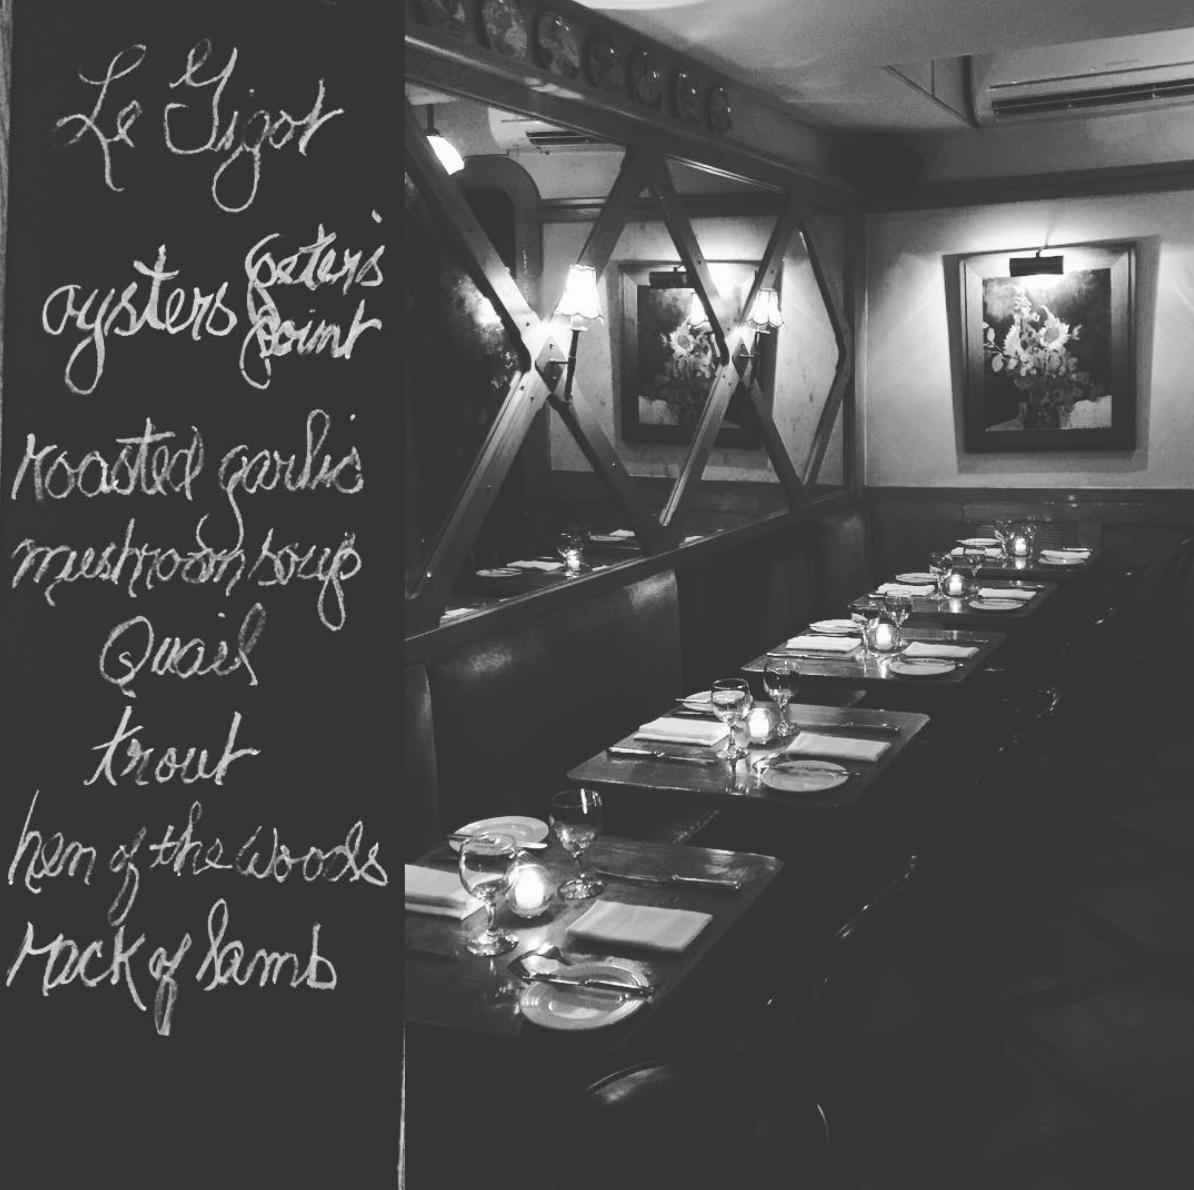 Le Gigot french restaurant west village 5